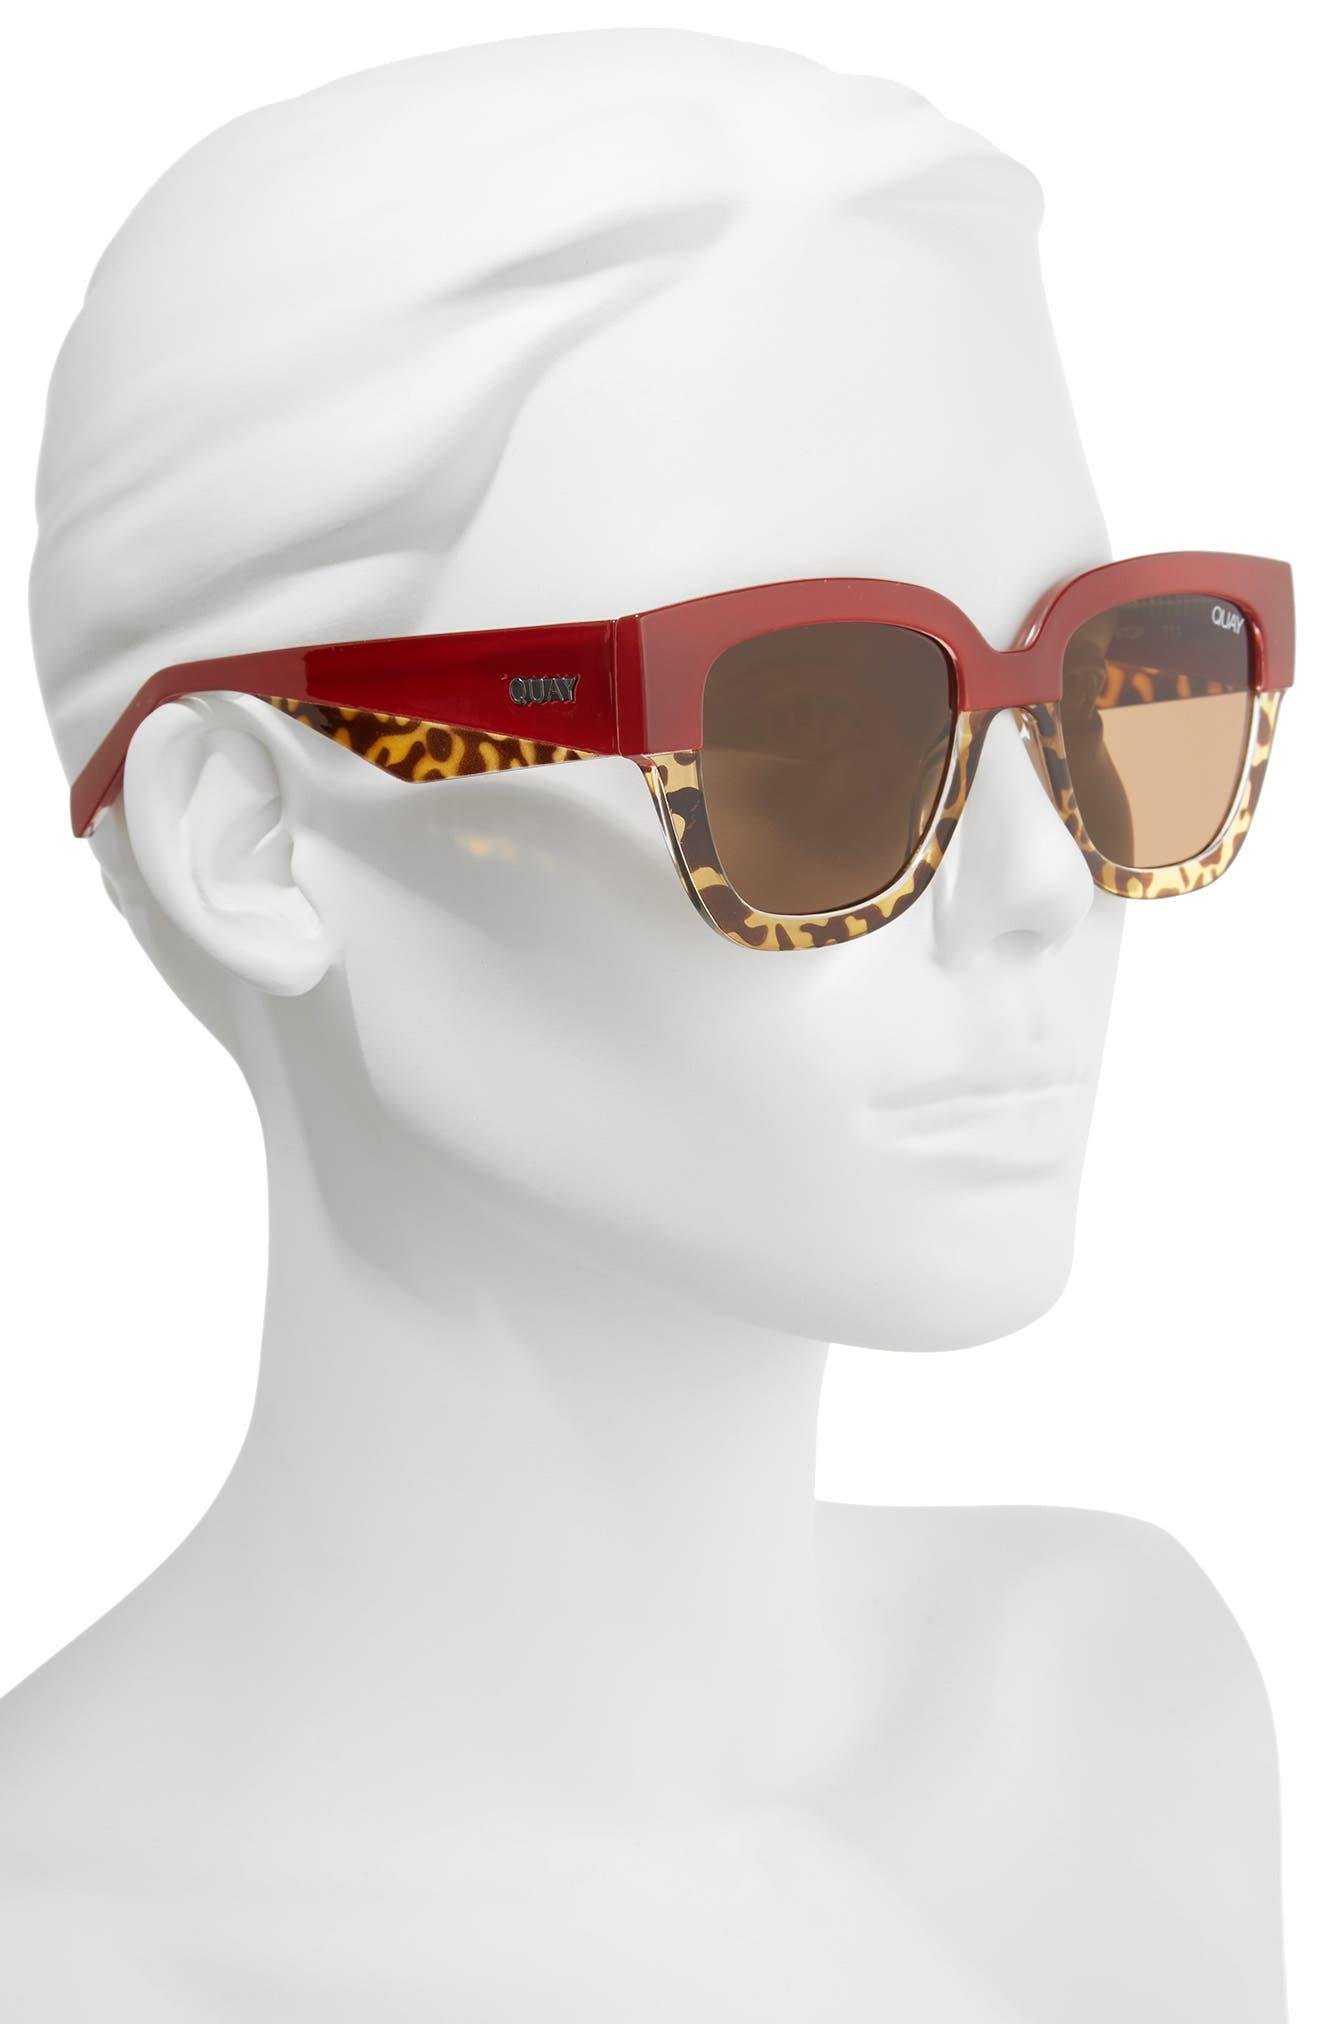 55mm Don't Stop Sunglasses,                             Alternate thumbnail 4, color,